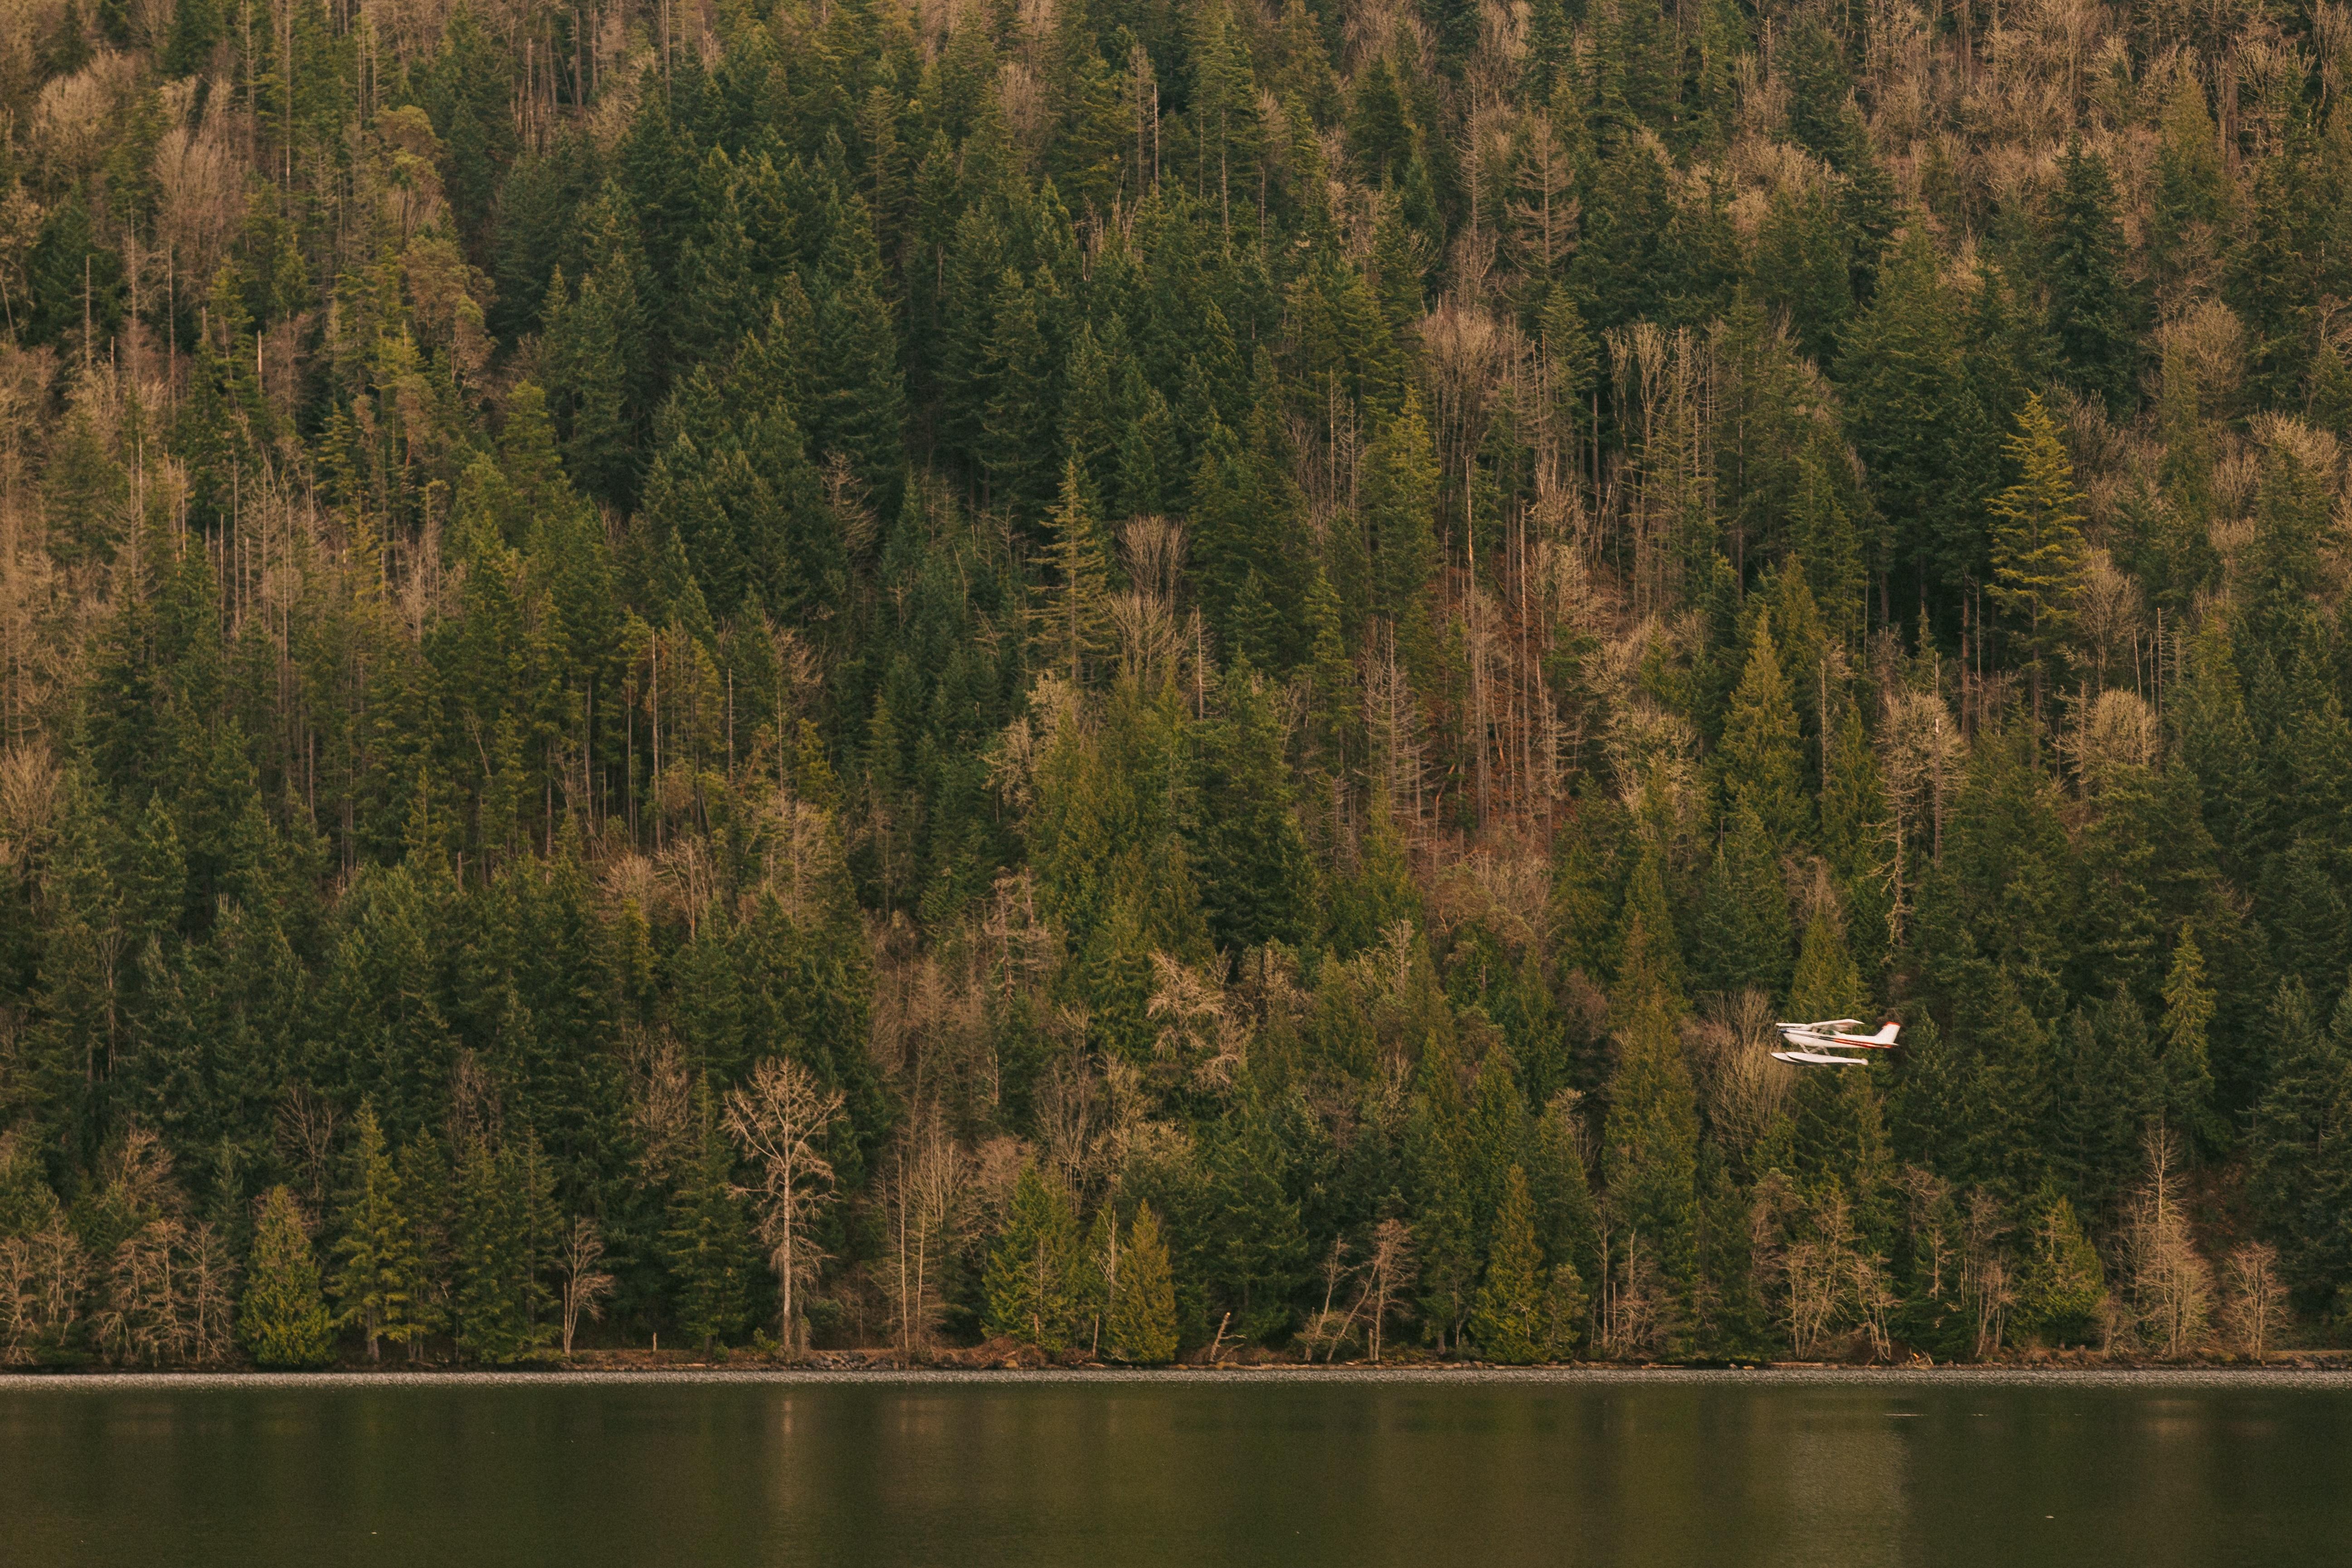 Private, Forest, Jet, Jungle, Lake, HQ Photo